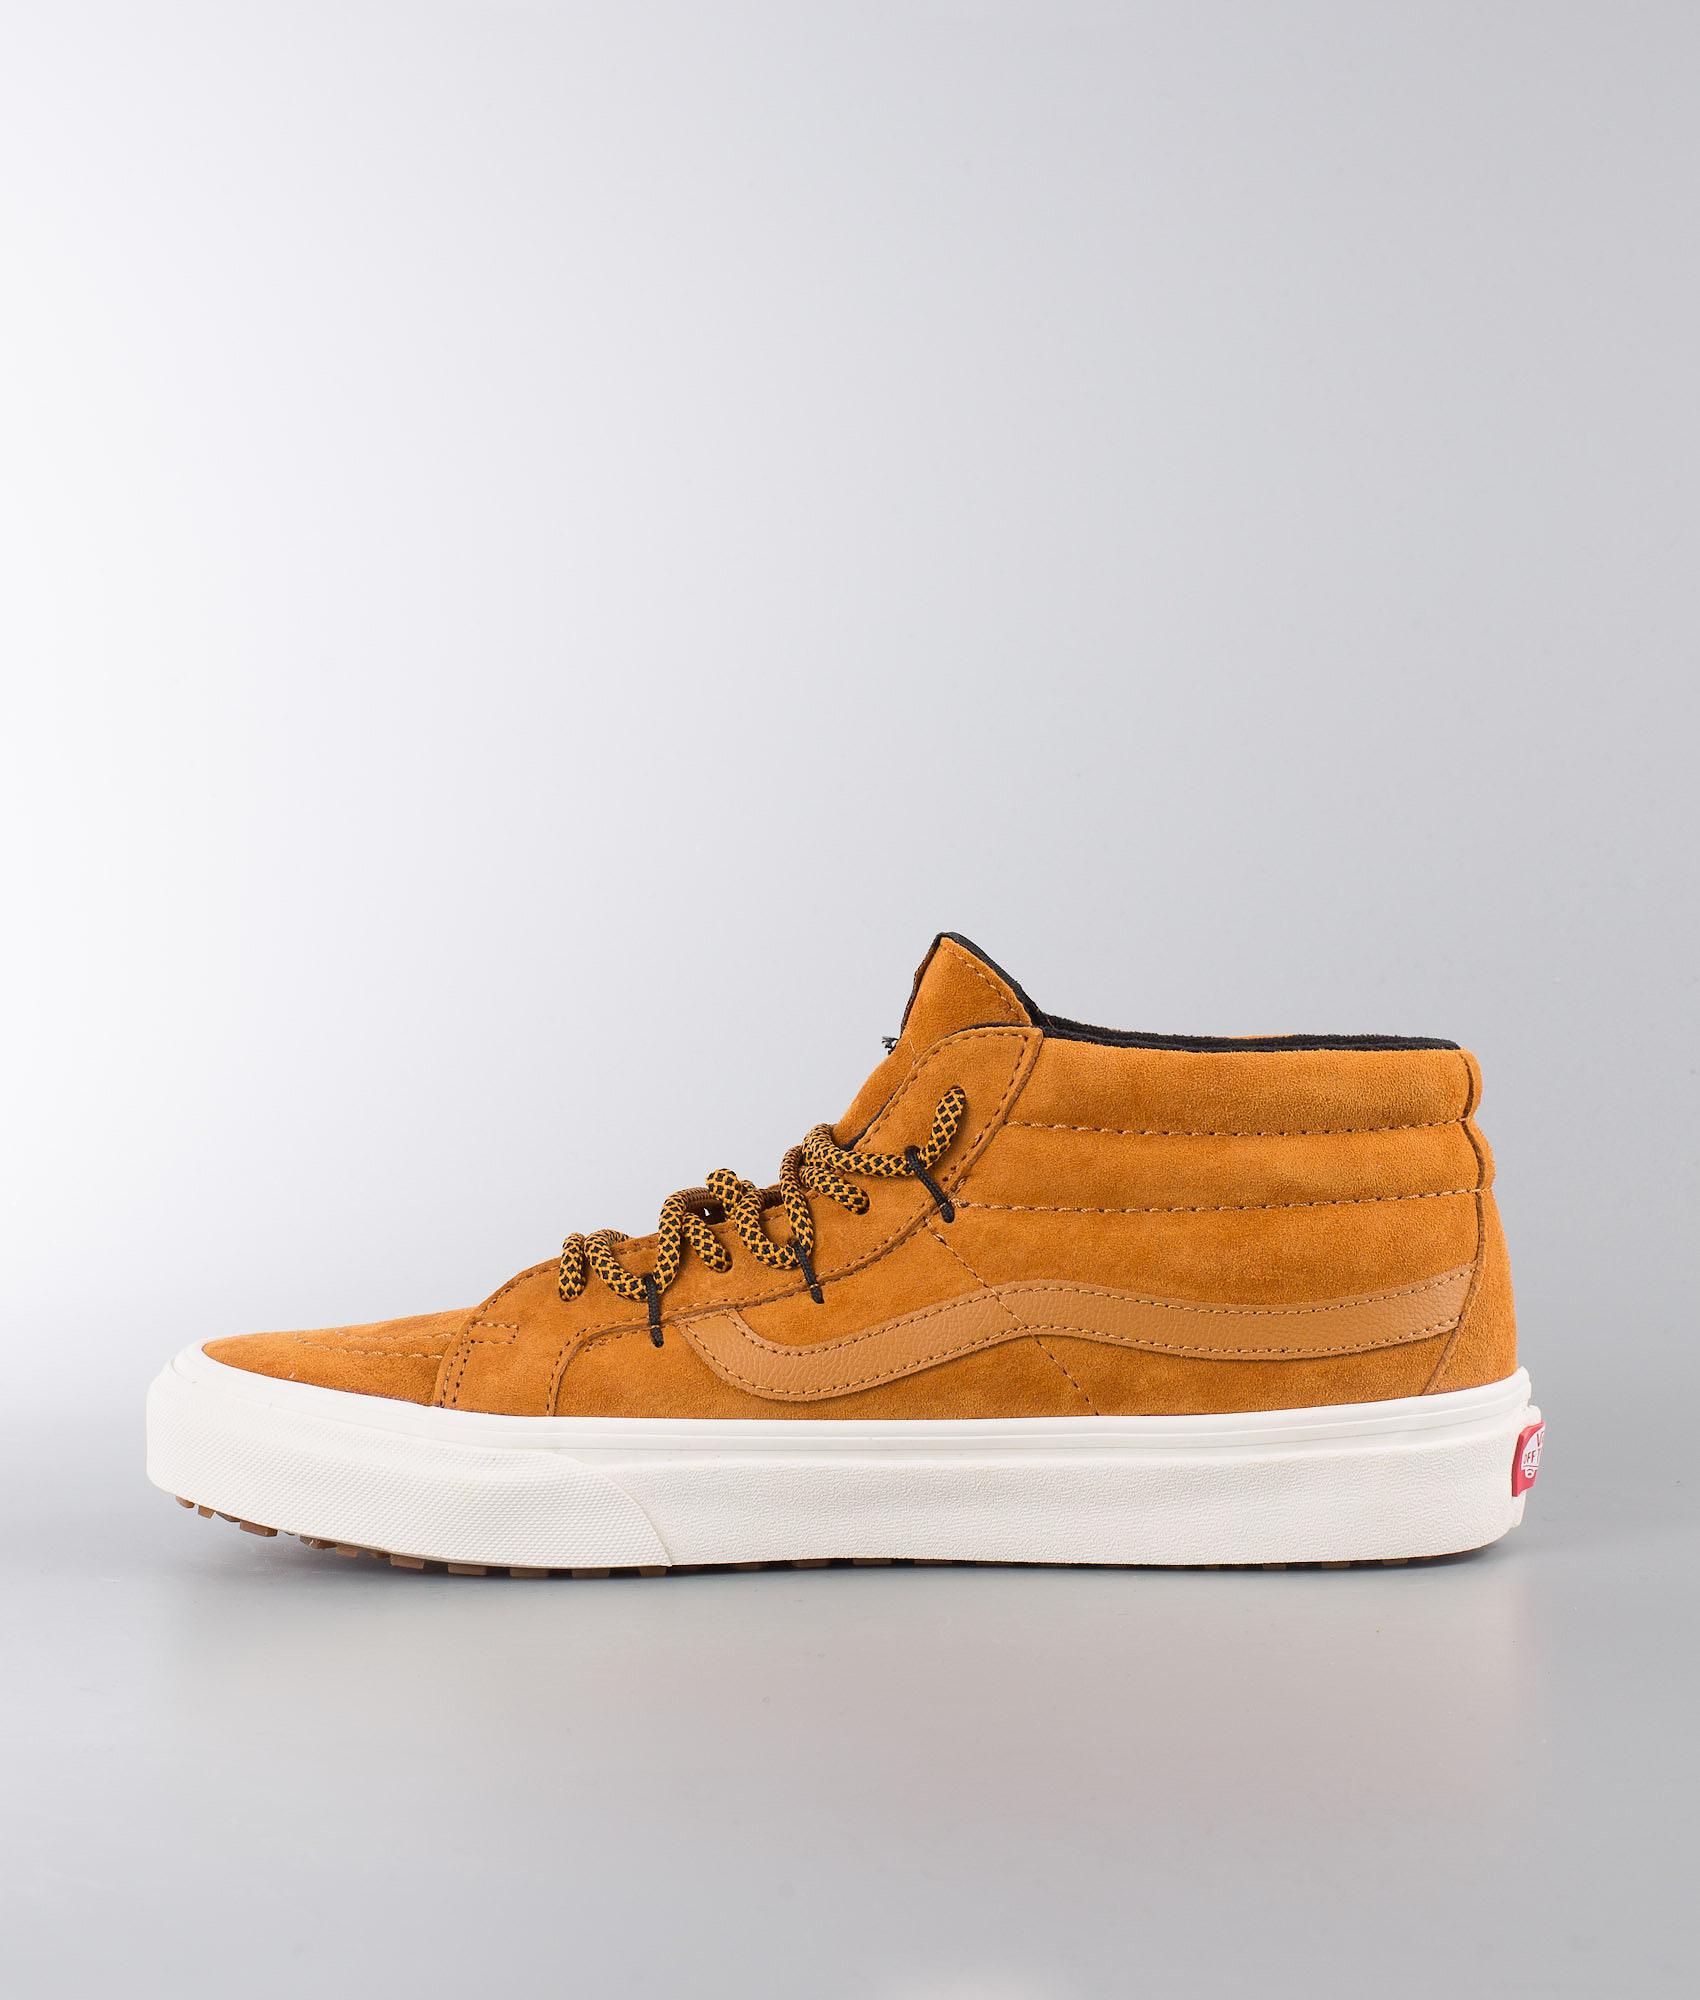 f765d366b9 Vans Sk8-Mid Reissue Ghillie Mte Shoes (Mte) Sudan Brown Marshmallow ...